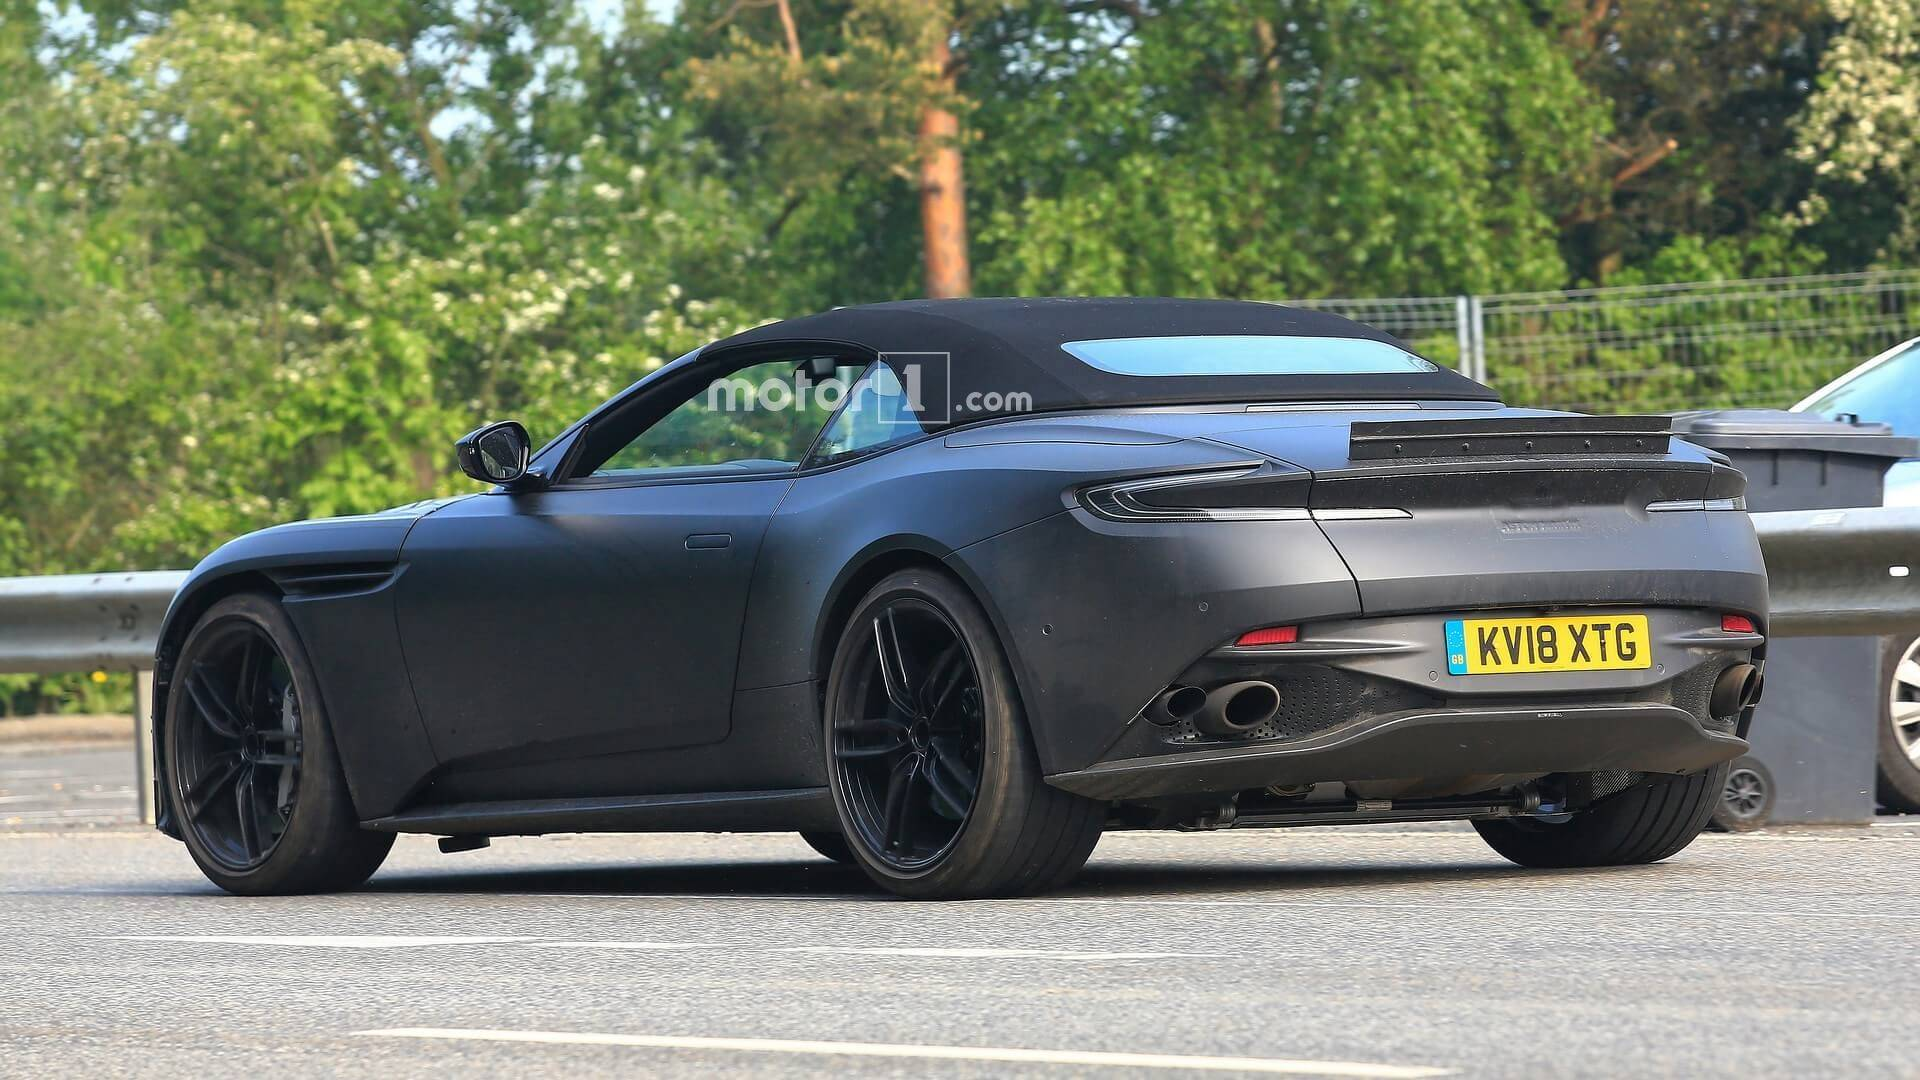 Aston Martin DBS Superleggera Volante spied testing 1920x1080